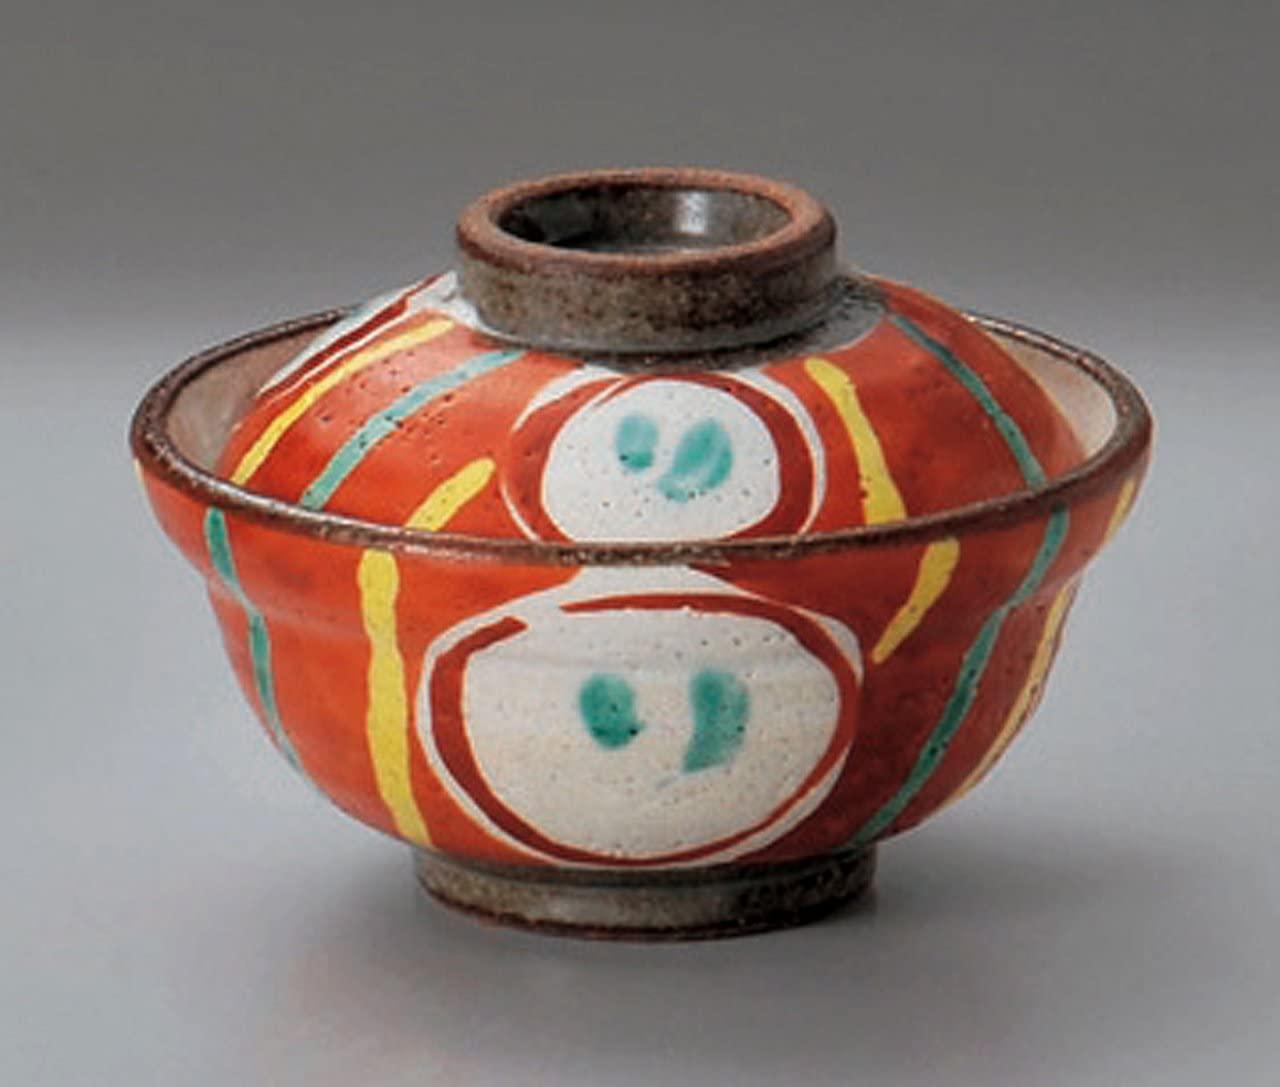 AKAE-MARUMON Tohki Japanese Pottery Small Bowl with the Cover